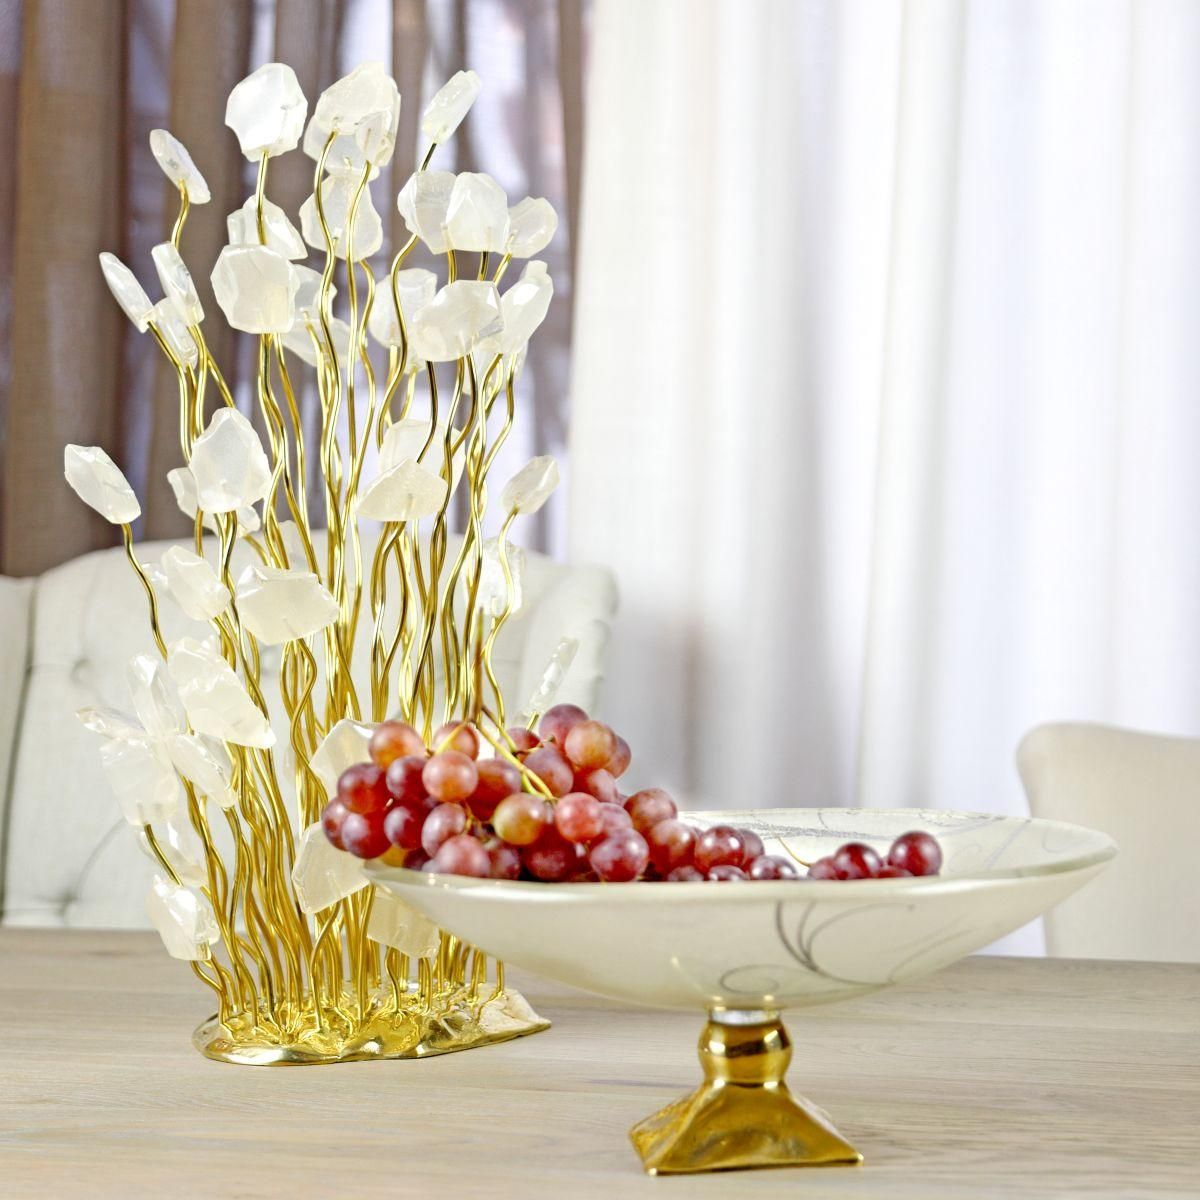 Annavasily Cagie Table Sculpture For Dining Table Decor